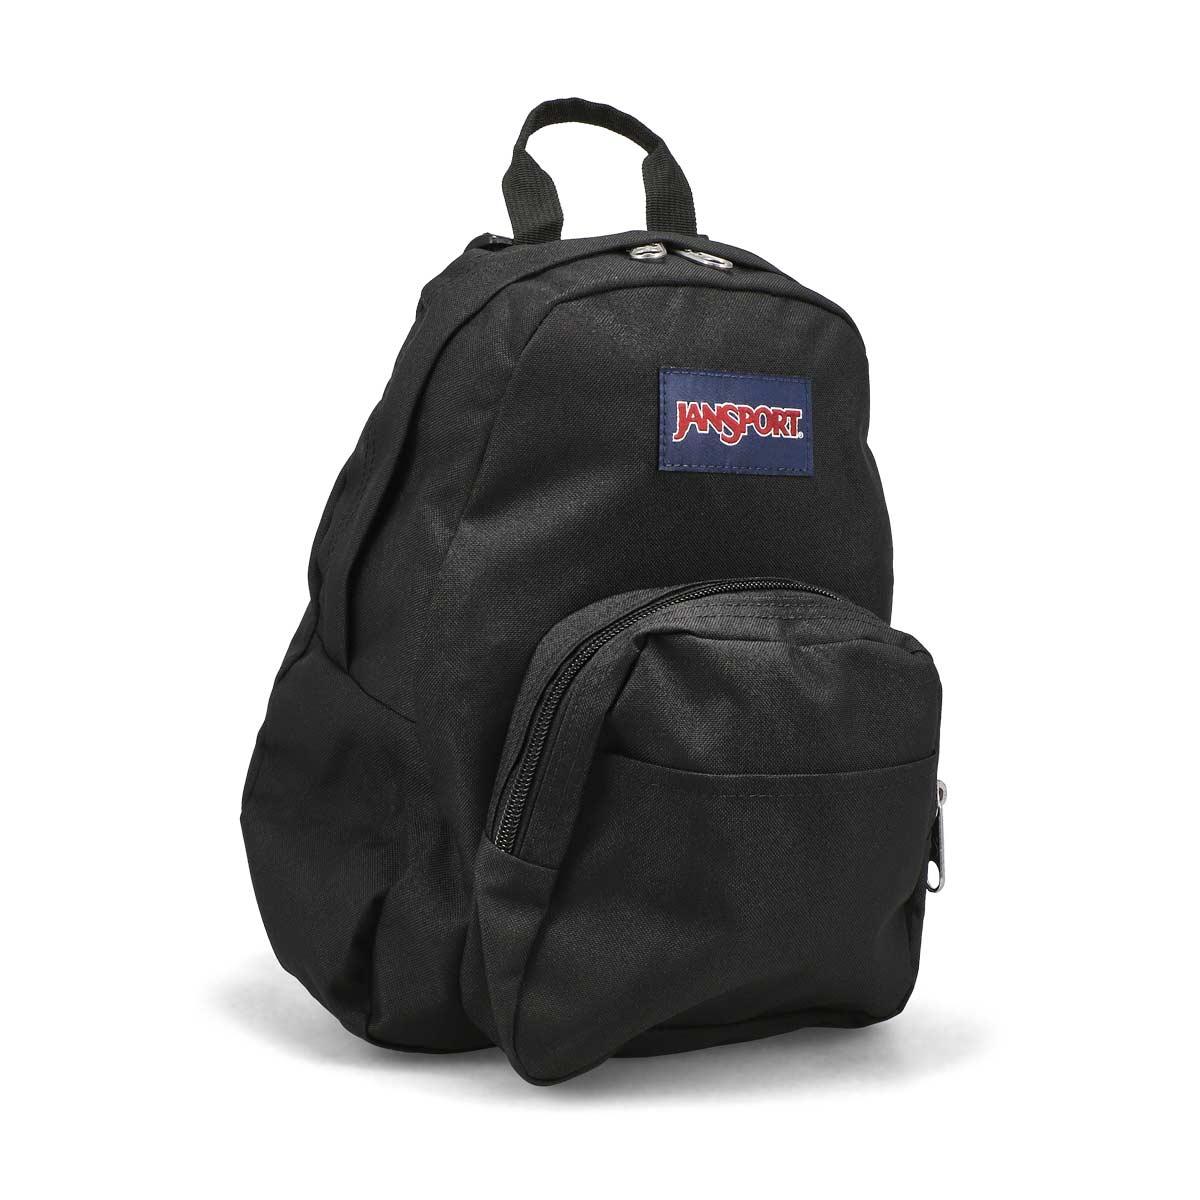 great discount for sale online meet Unisex HALF PINT black backpack